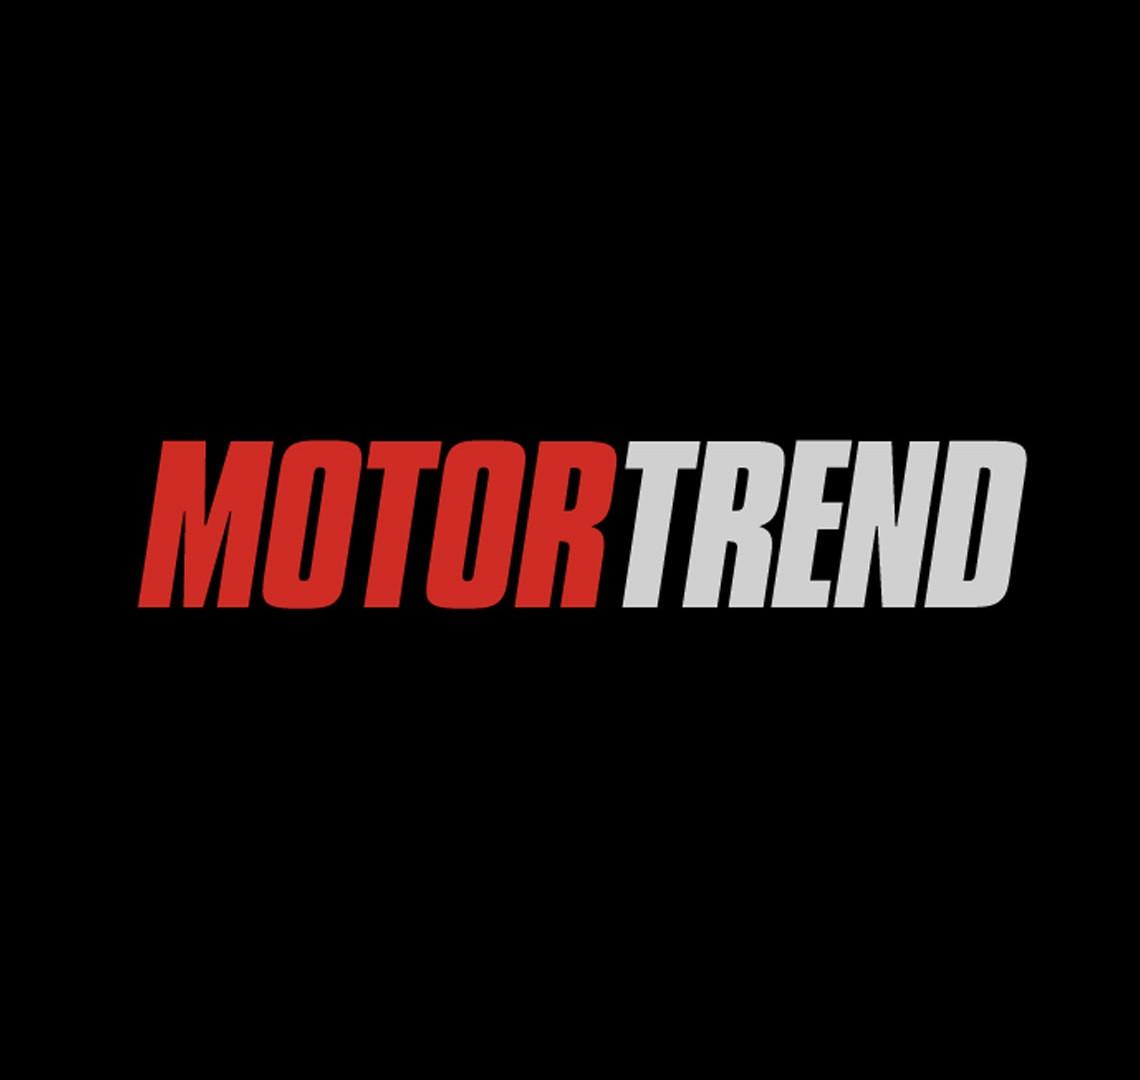 MotorTrend Logo.jpg